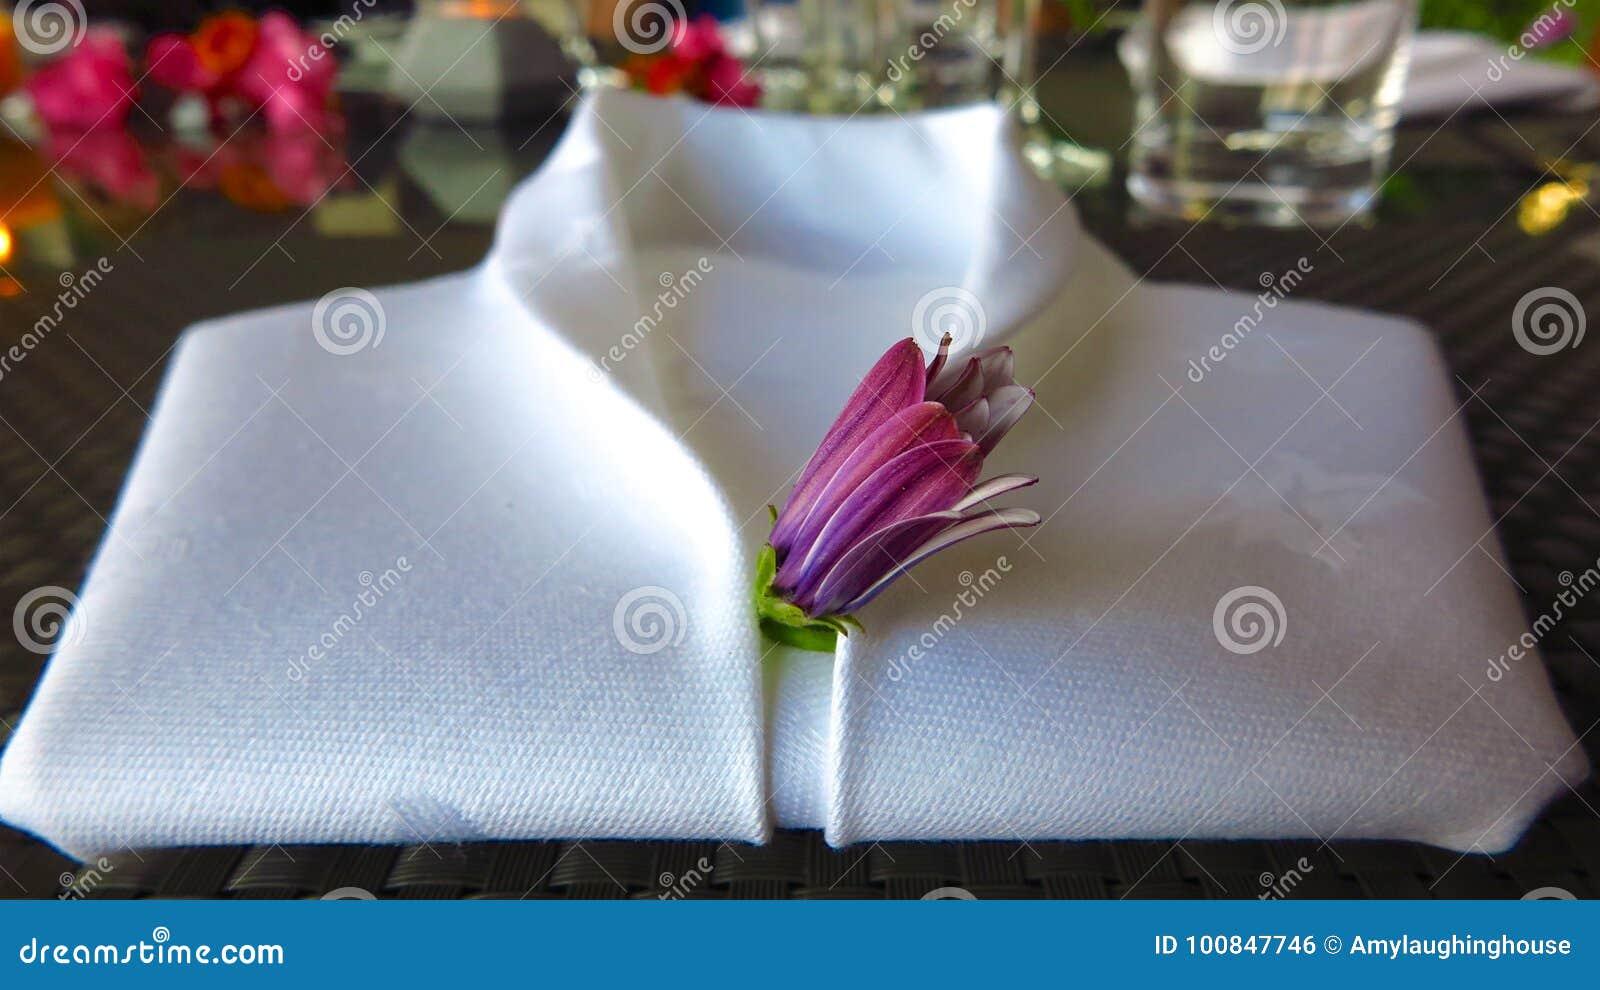 White Linen Napkin Folded Into Shape Of Tuxedo Shirt Stock Photo Image Of Romantic Romance 100847746